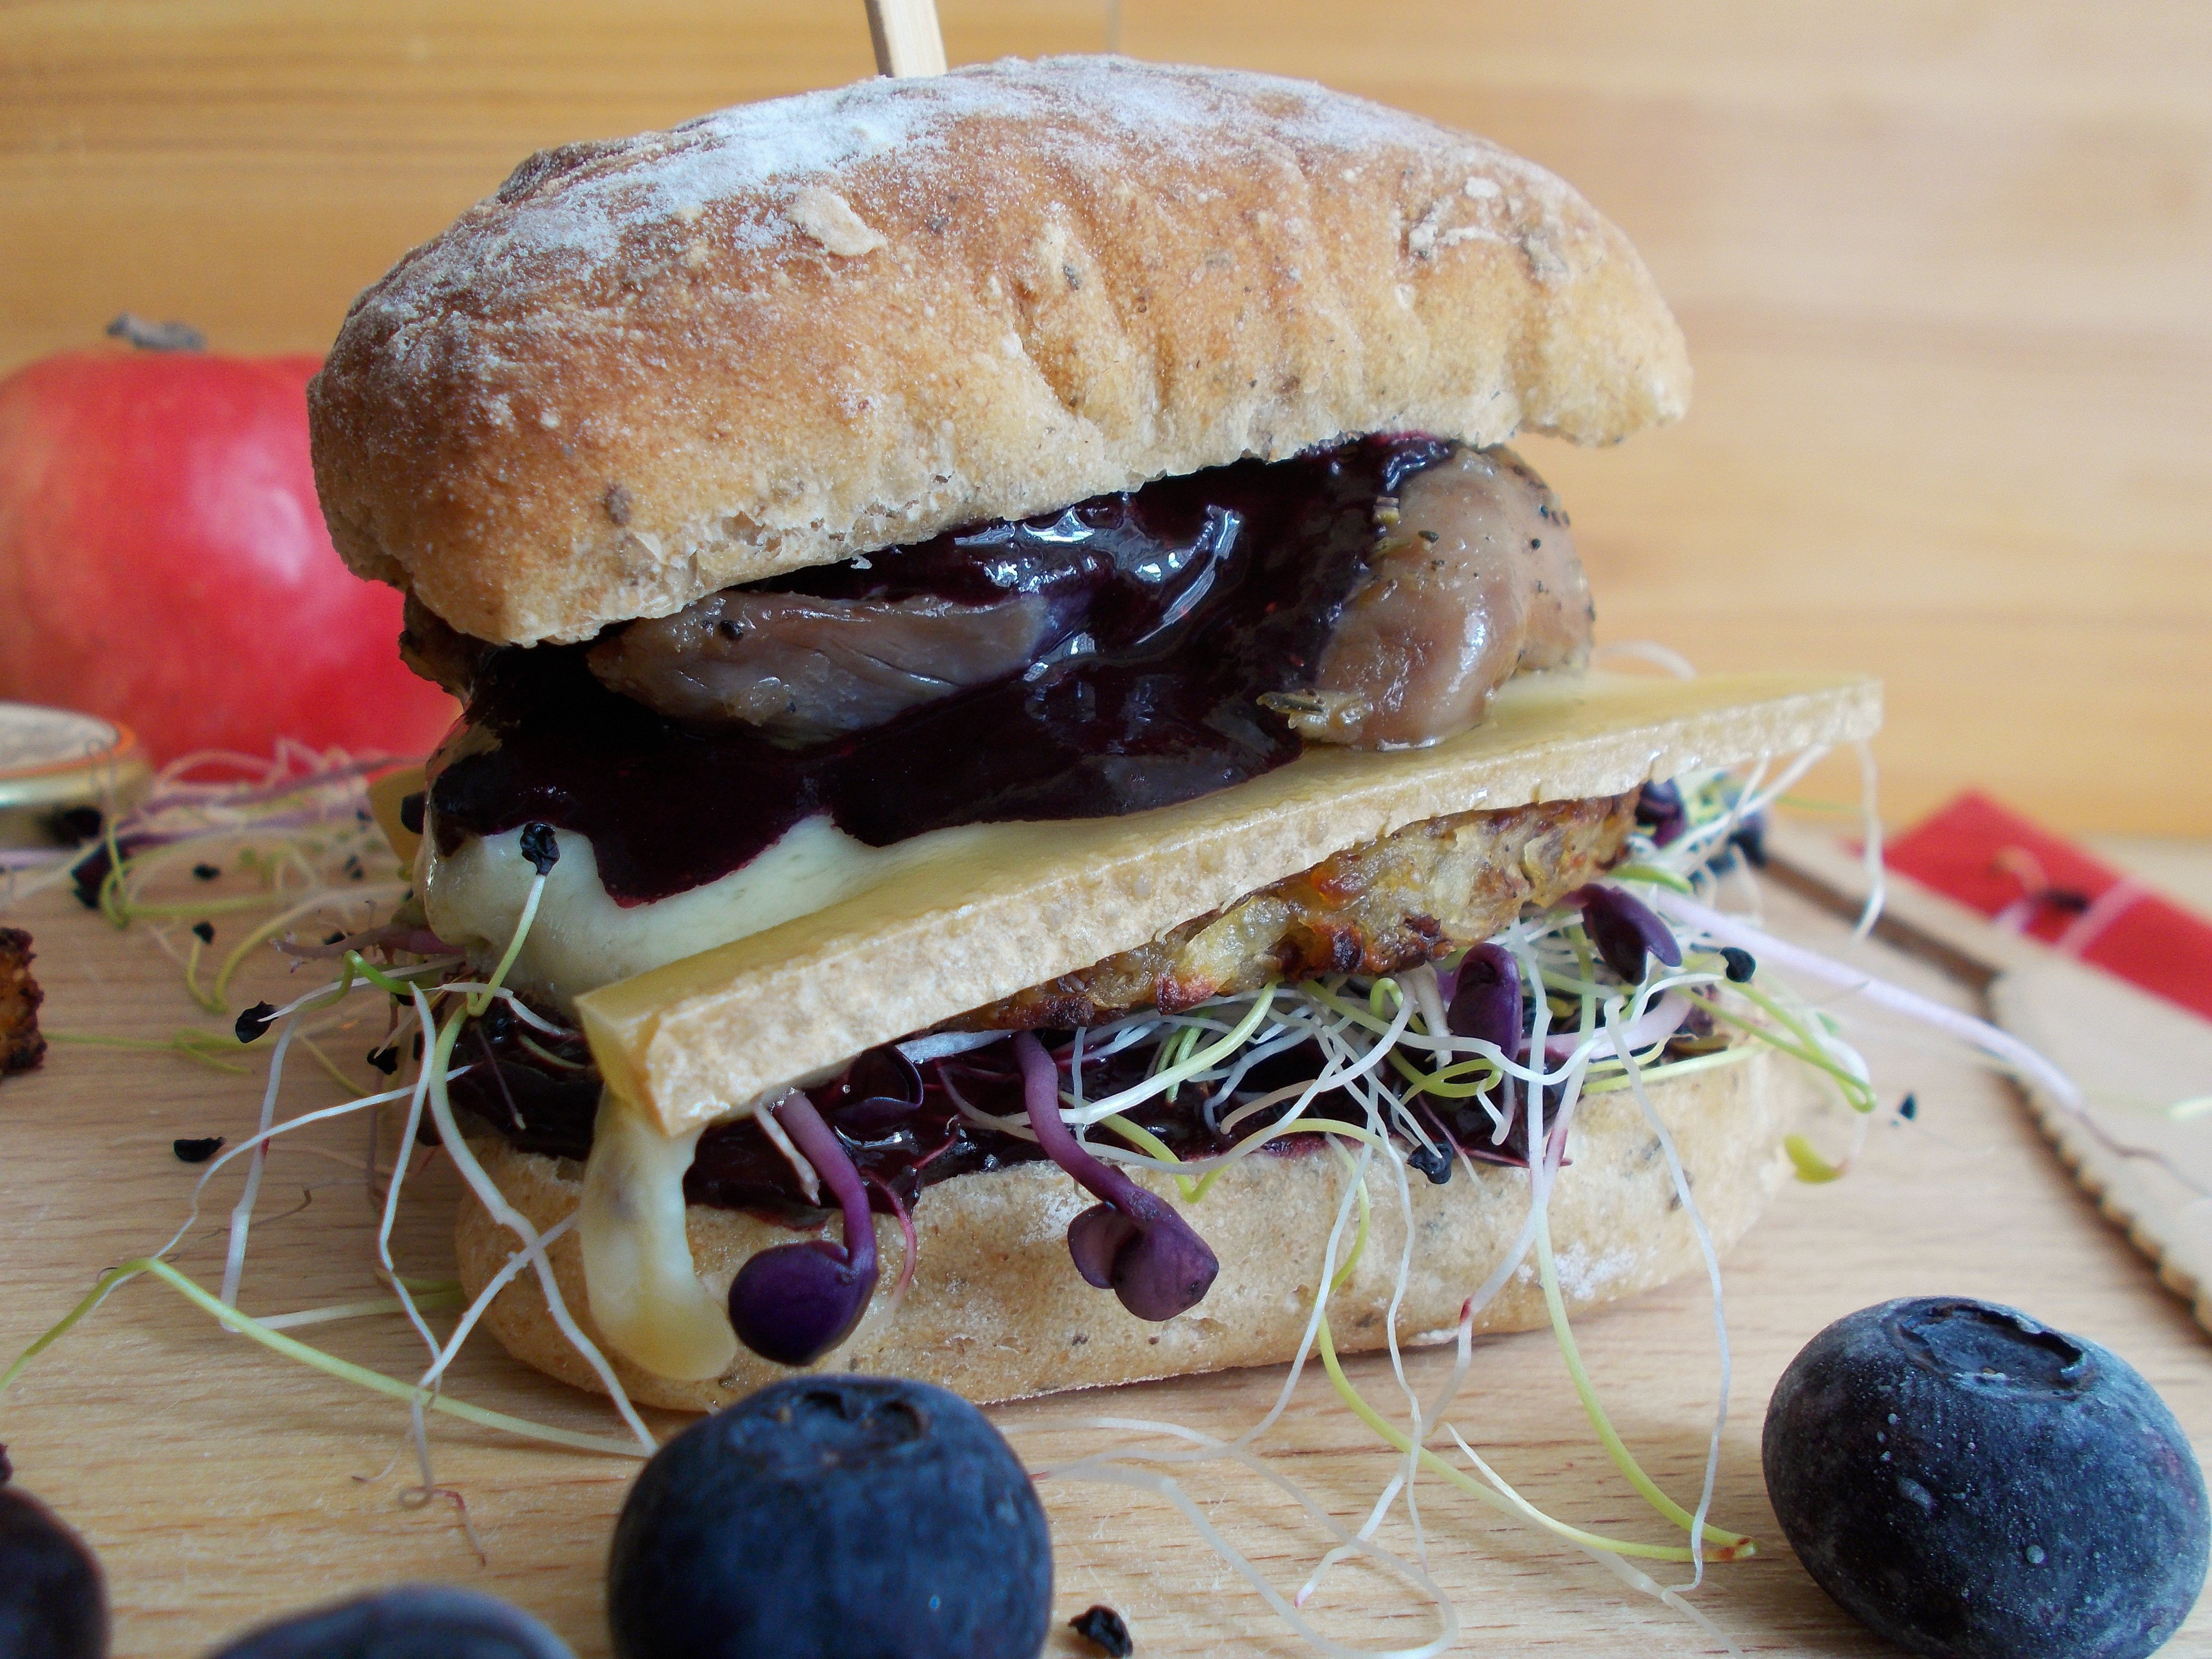 Burger montagnard : rösti, myrtille, Abondance et confit de canard